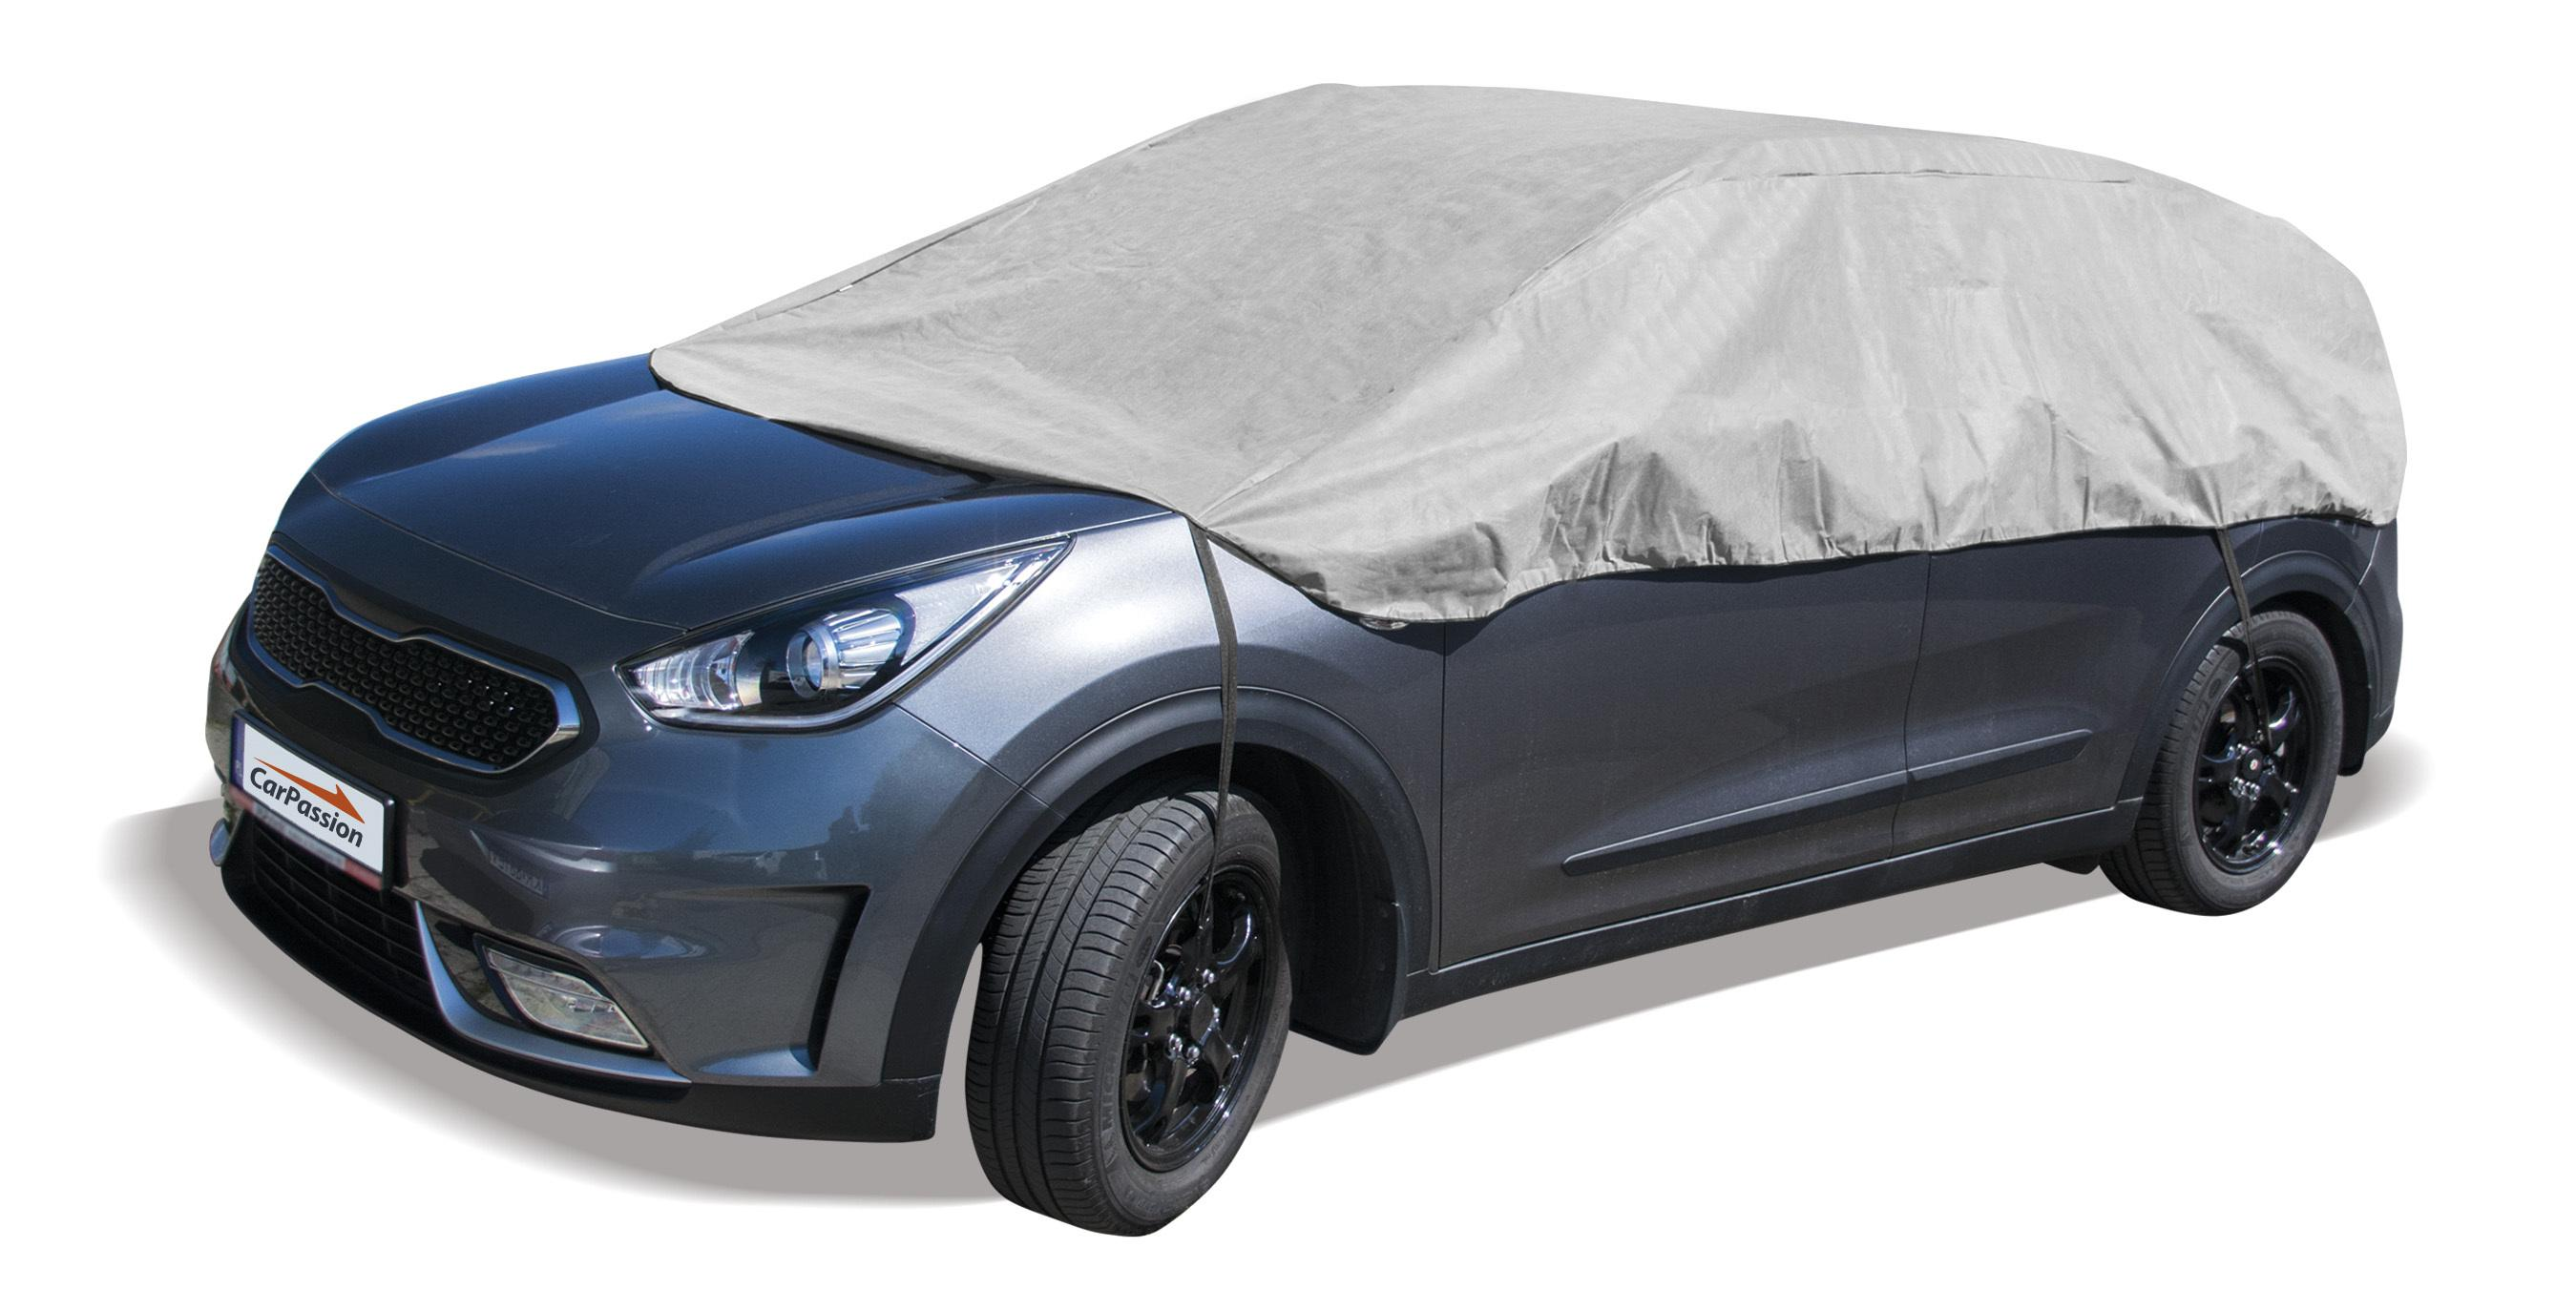 Auto afdekhoes CARPASSION 10015 waardering